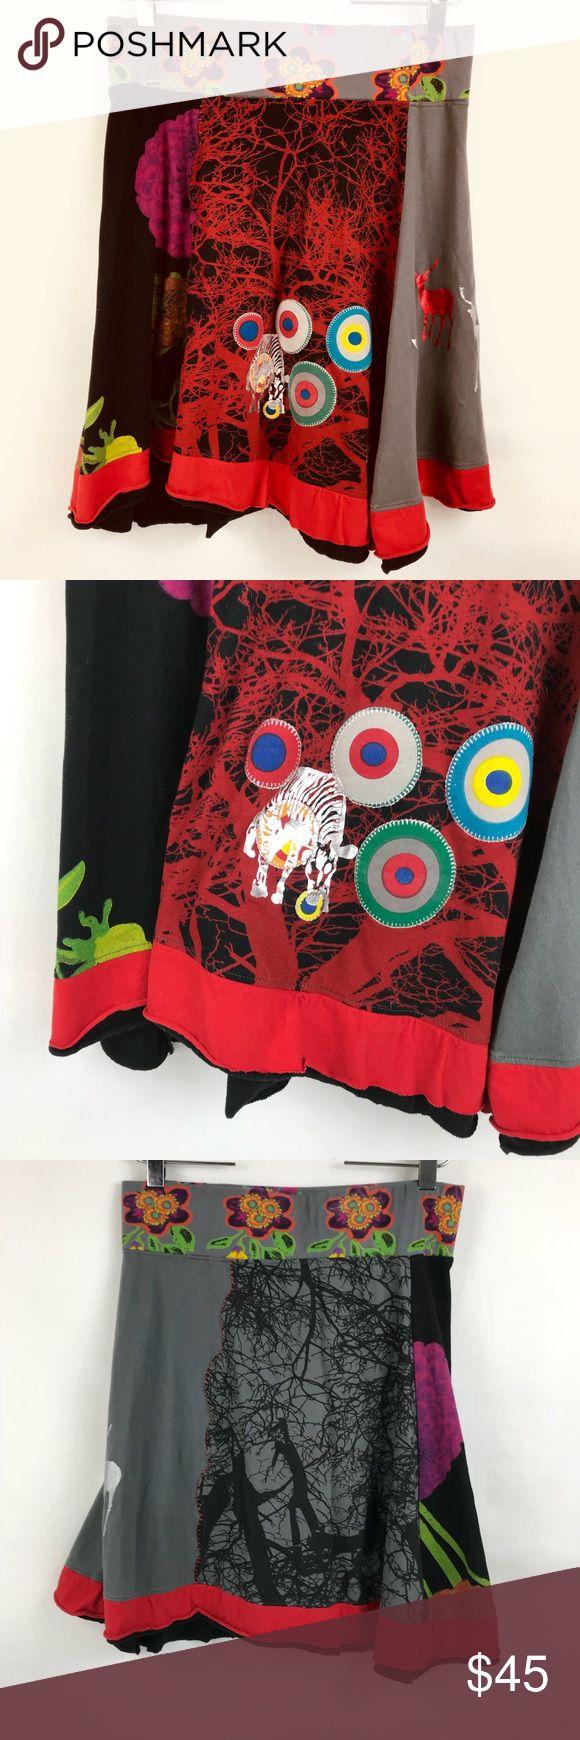 "Desigual Skirt Elastic Waist Sz XL 100% Cotton Desigual Skirt Multi color Size XL Waist 32"" Length 23"" Measurements are approximate Desigual Skirts A-Line or Full"